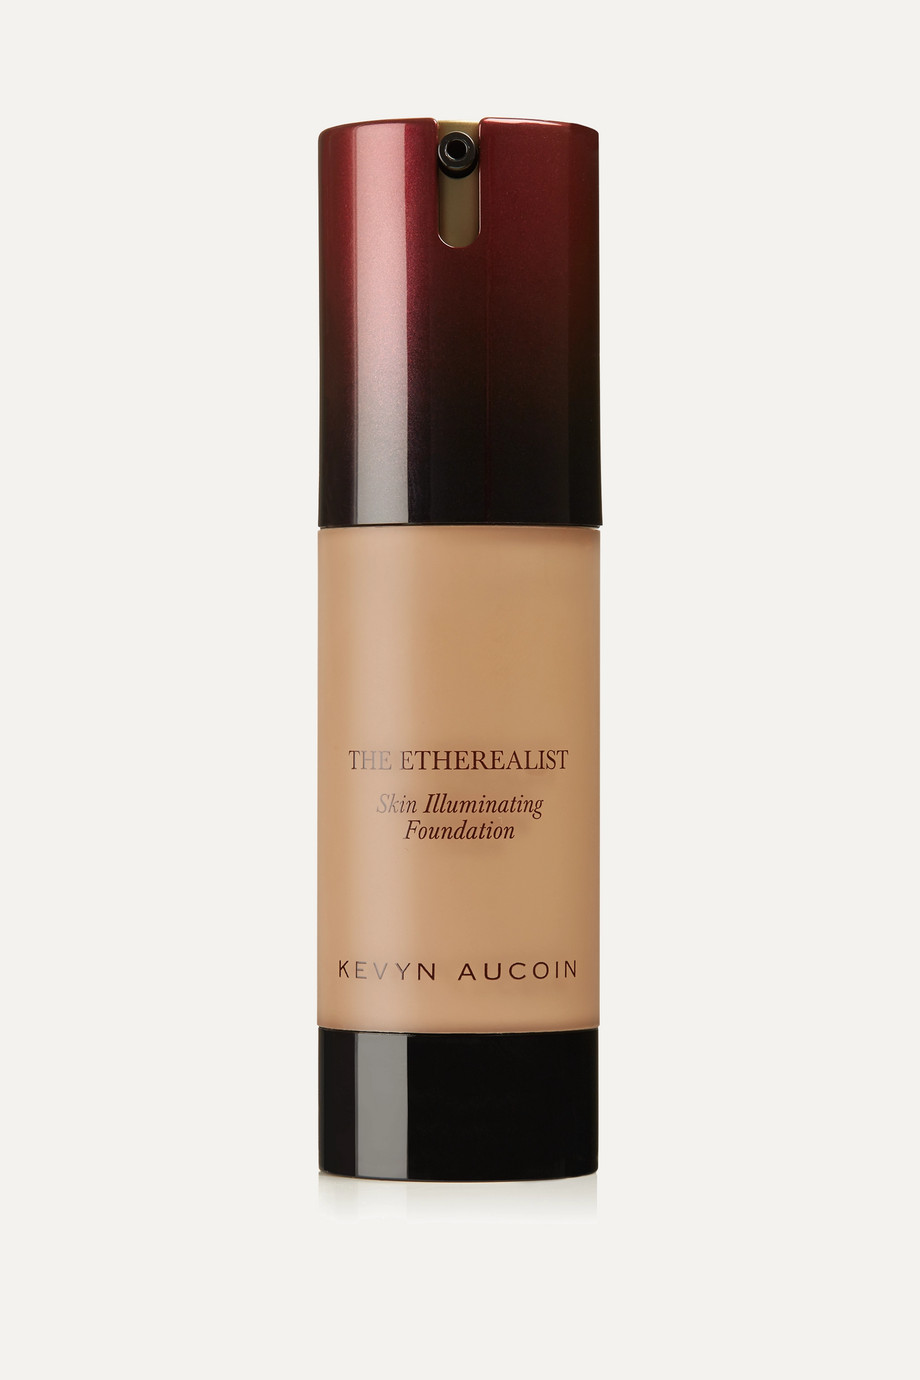 Kevyn Aucoin The Etherealist Skin Illuminating Foundation - Deep EF 13, 28ml